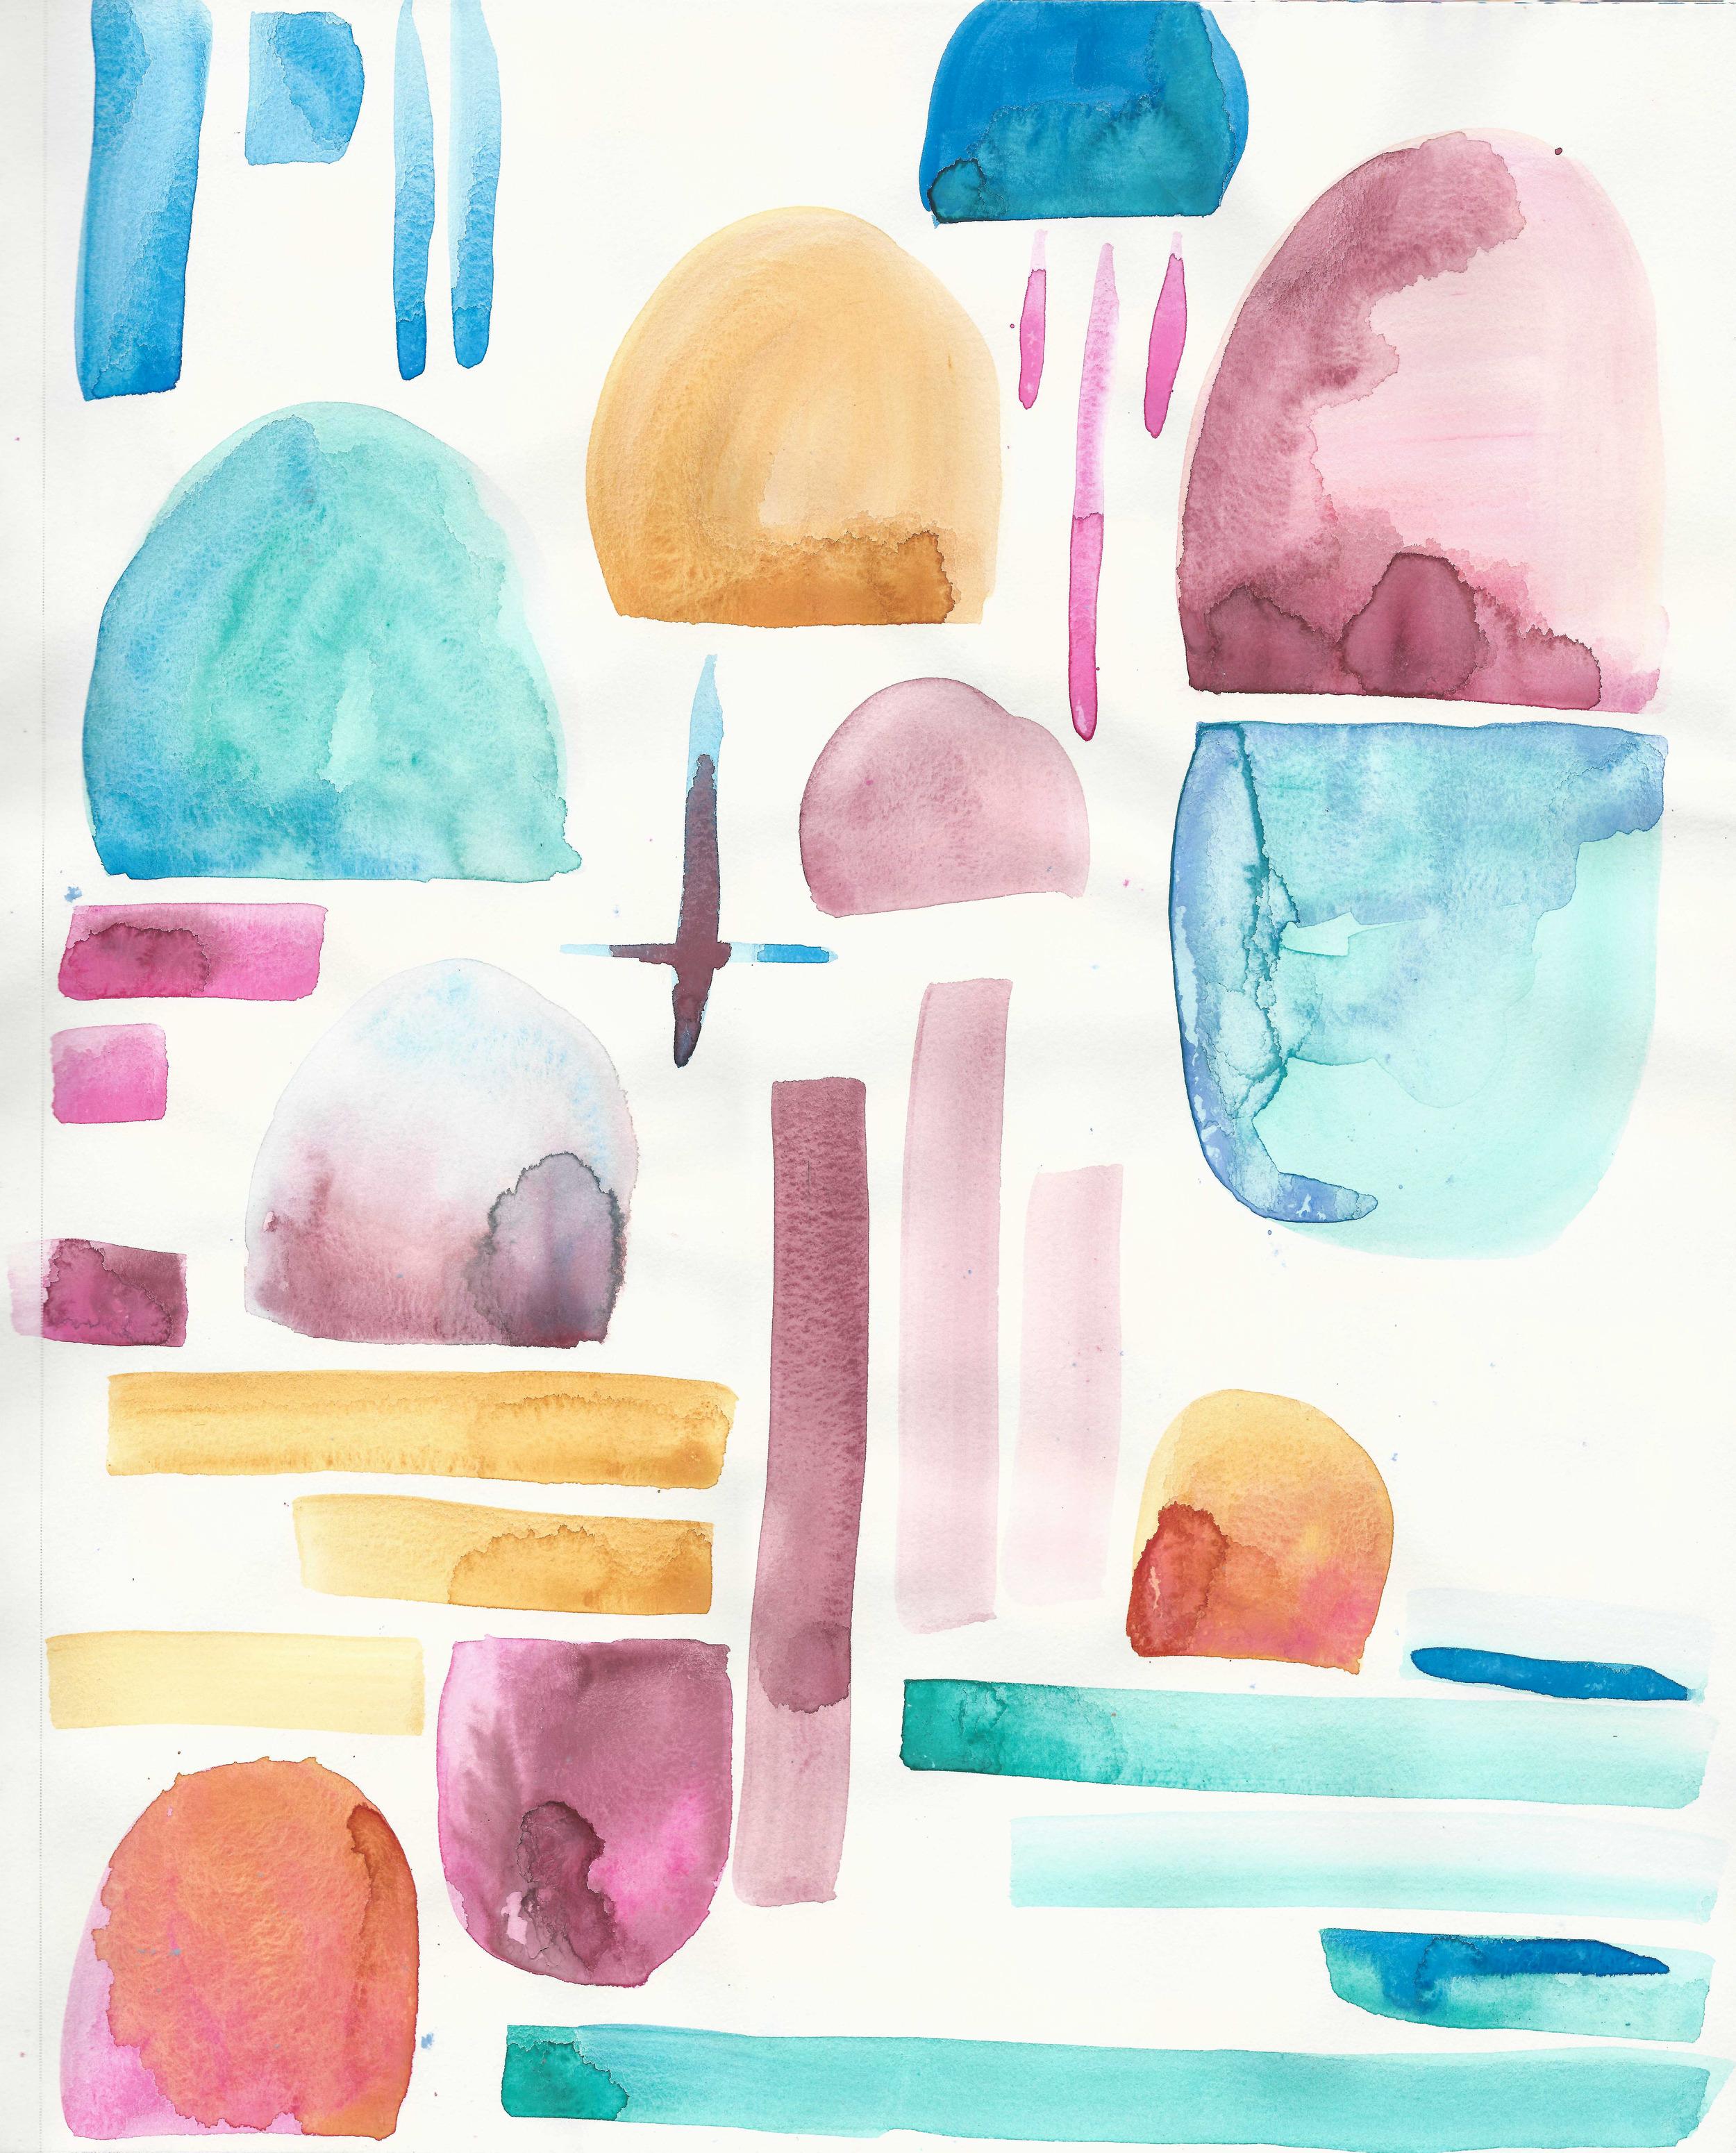 half moon jewels watercolor 11x14 paper.jpg